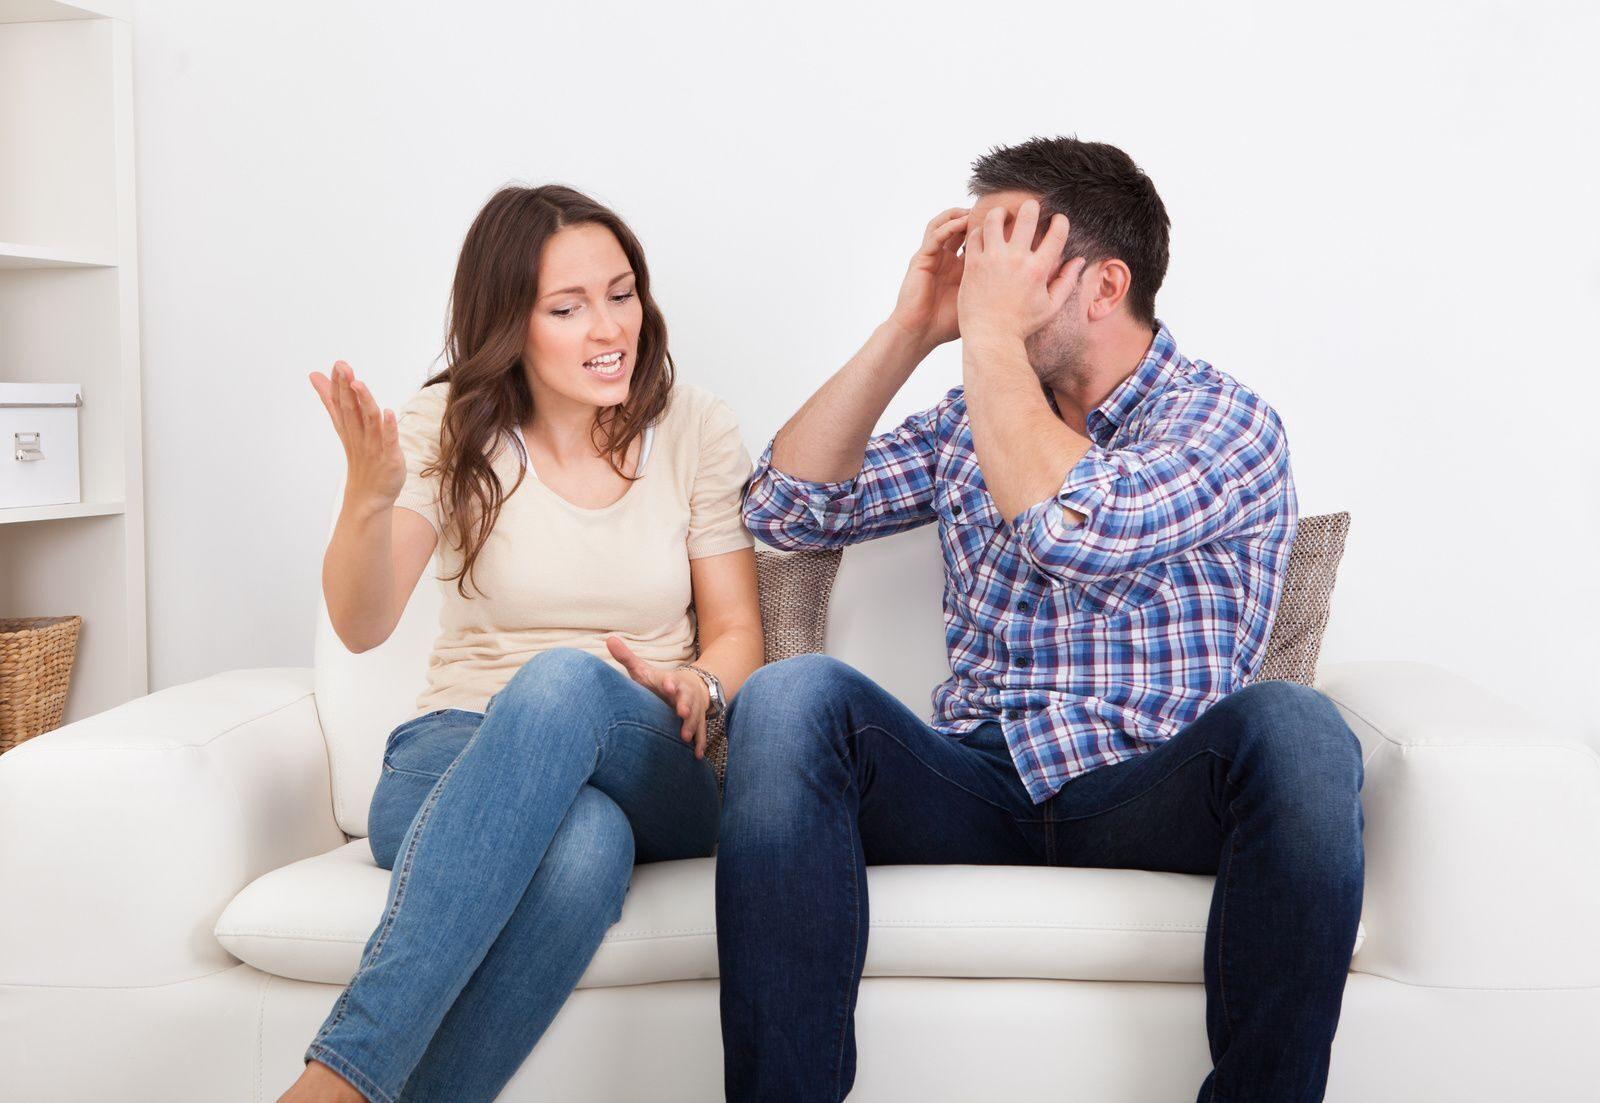 Смешные картинки муж и жена спорят, картинки про